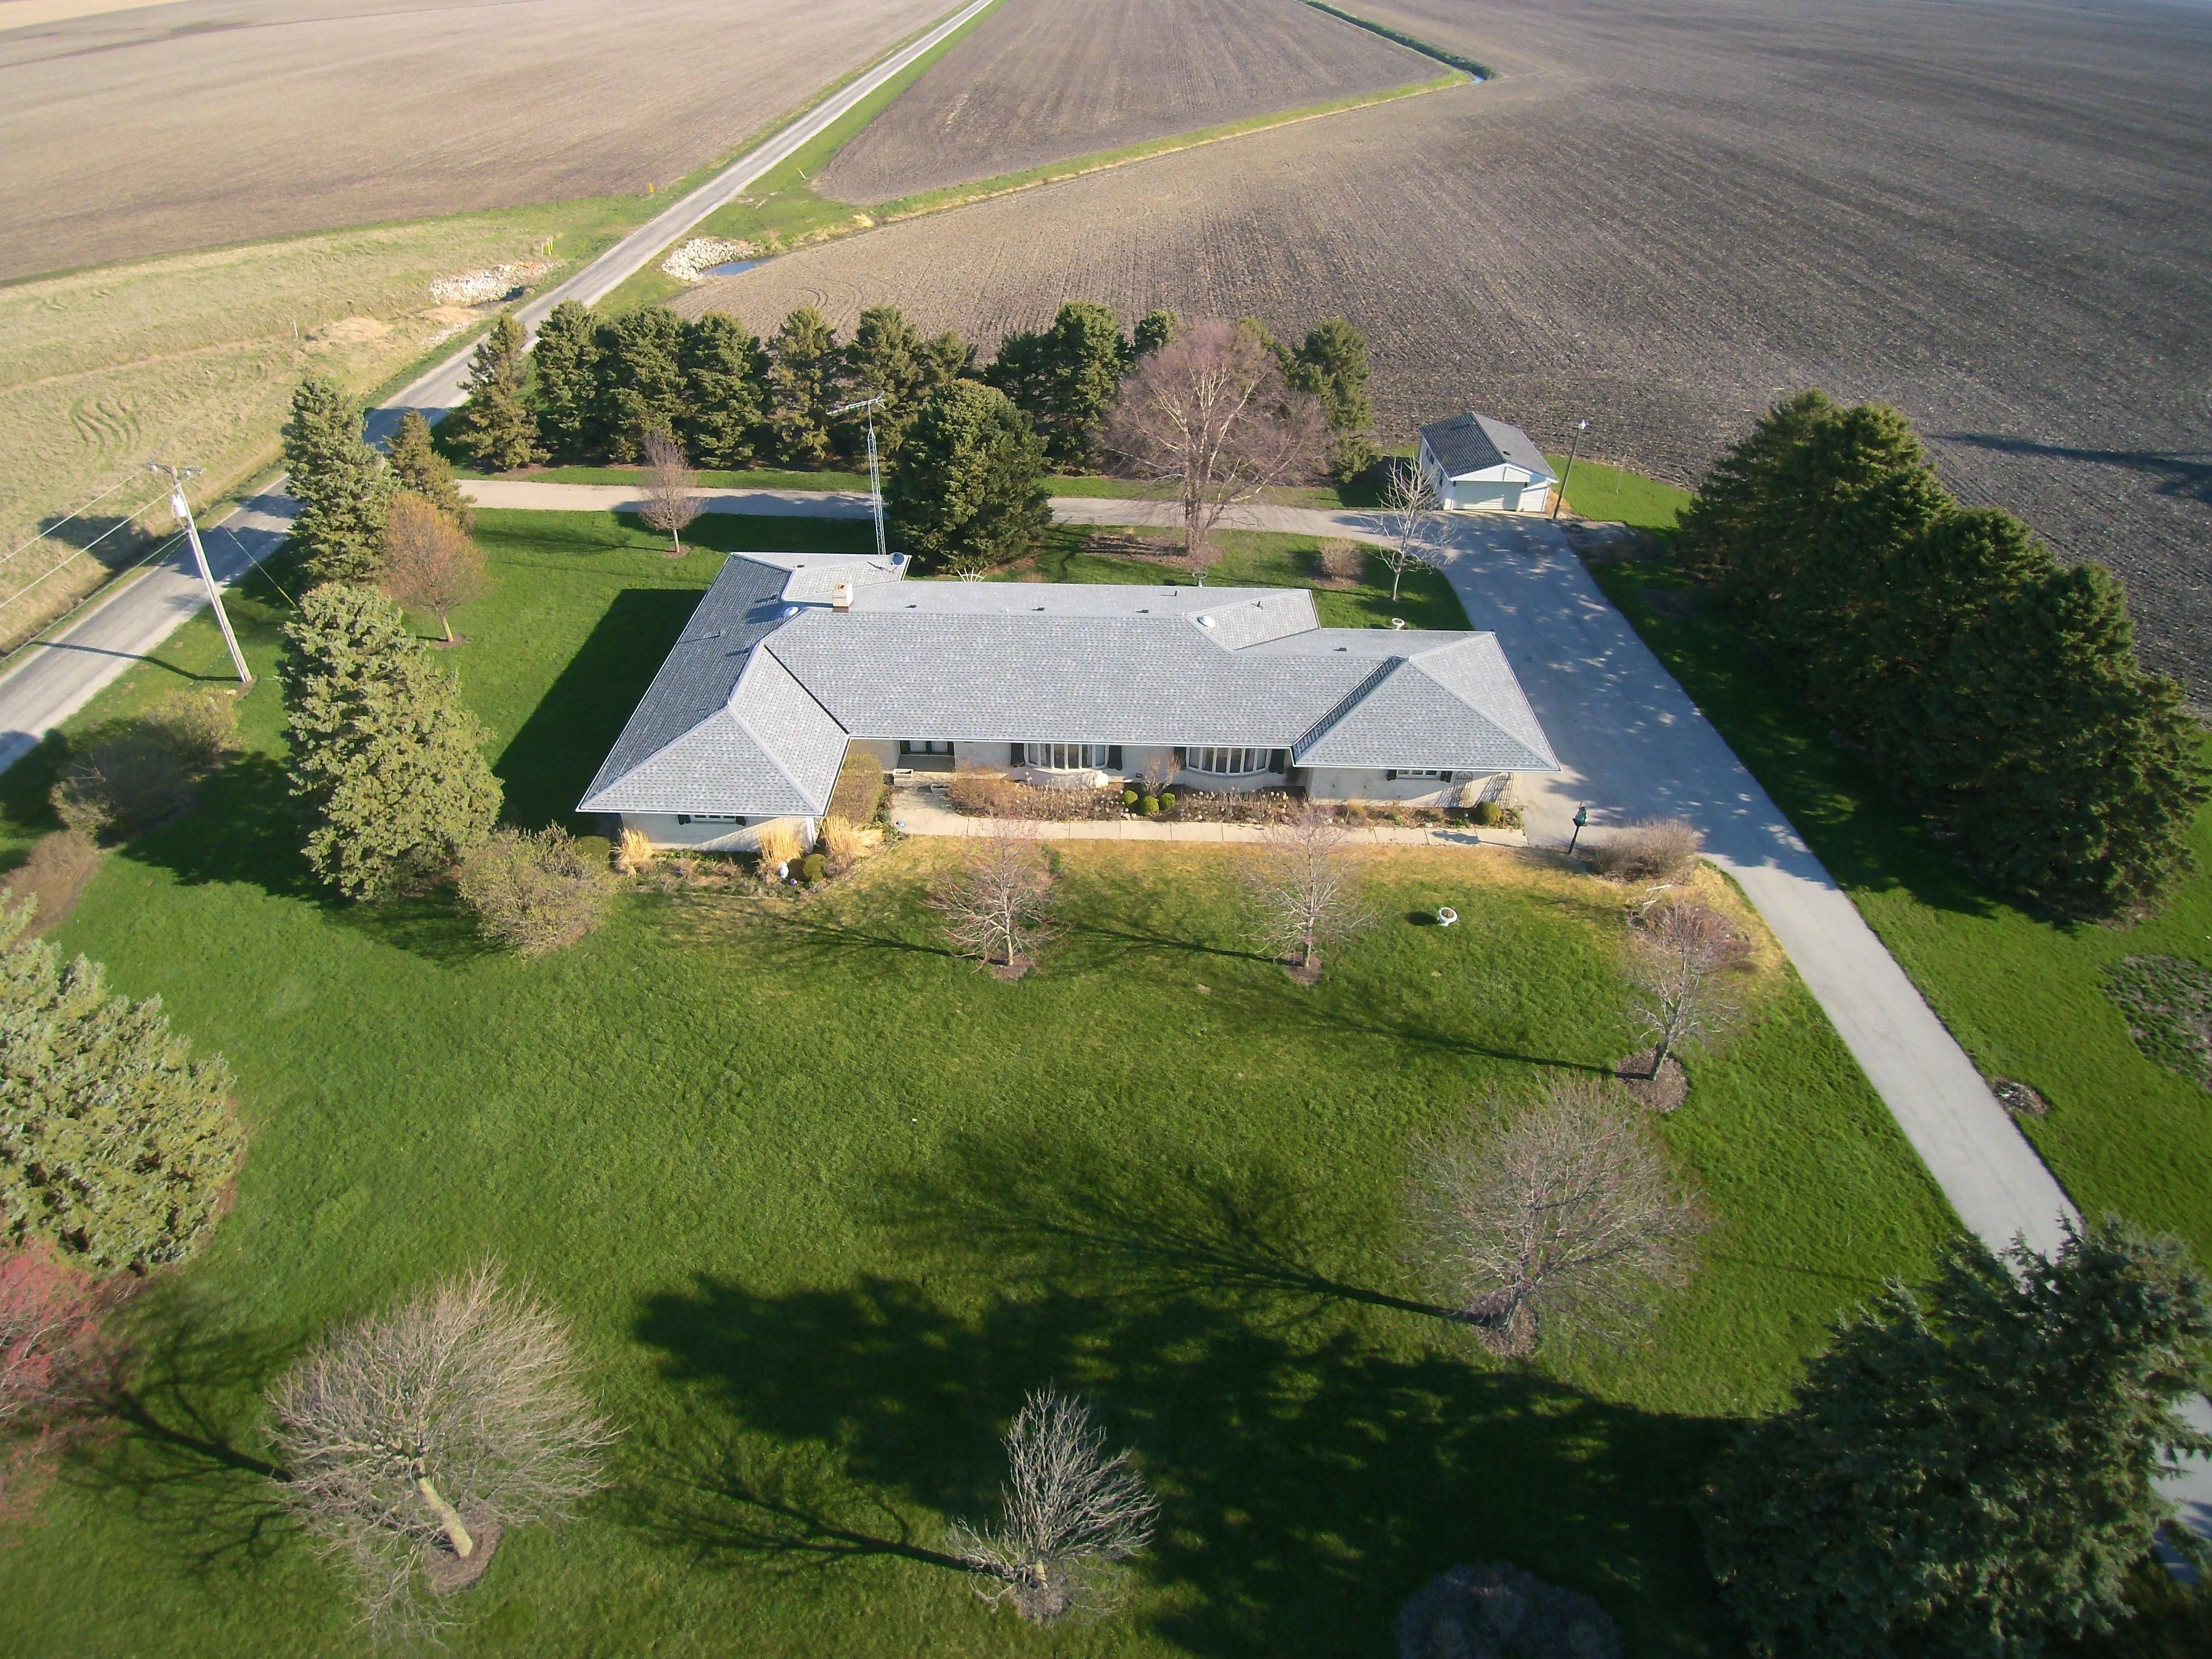 Illinois grundy county kinsman - Illinois Grundy County Kinsman 5